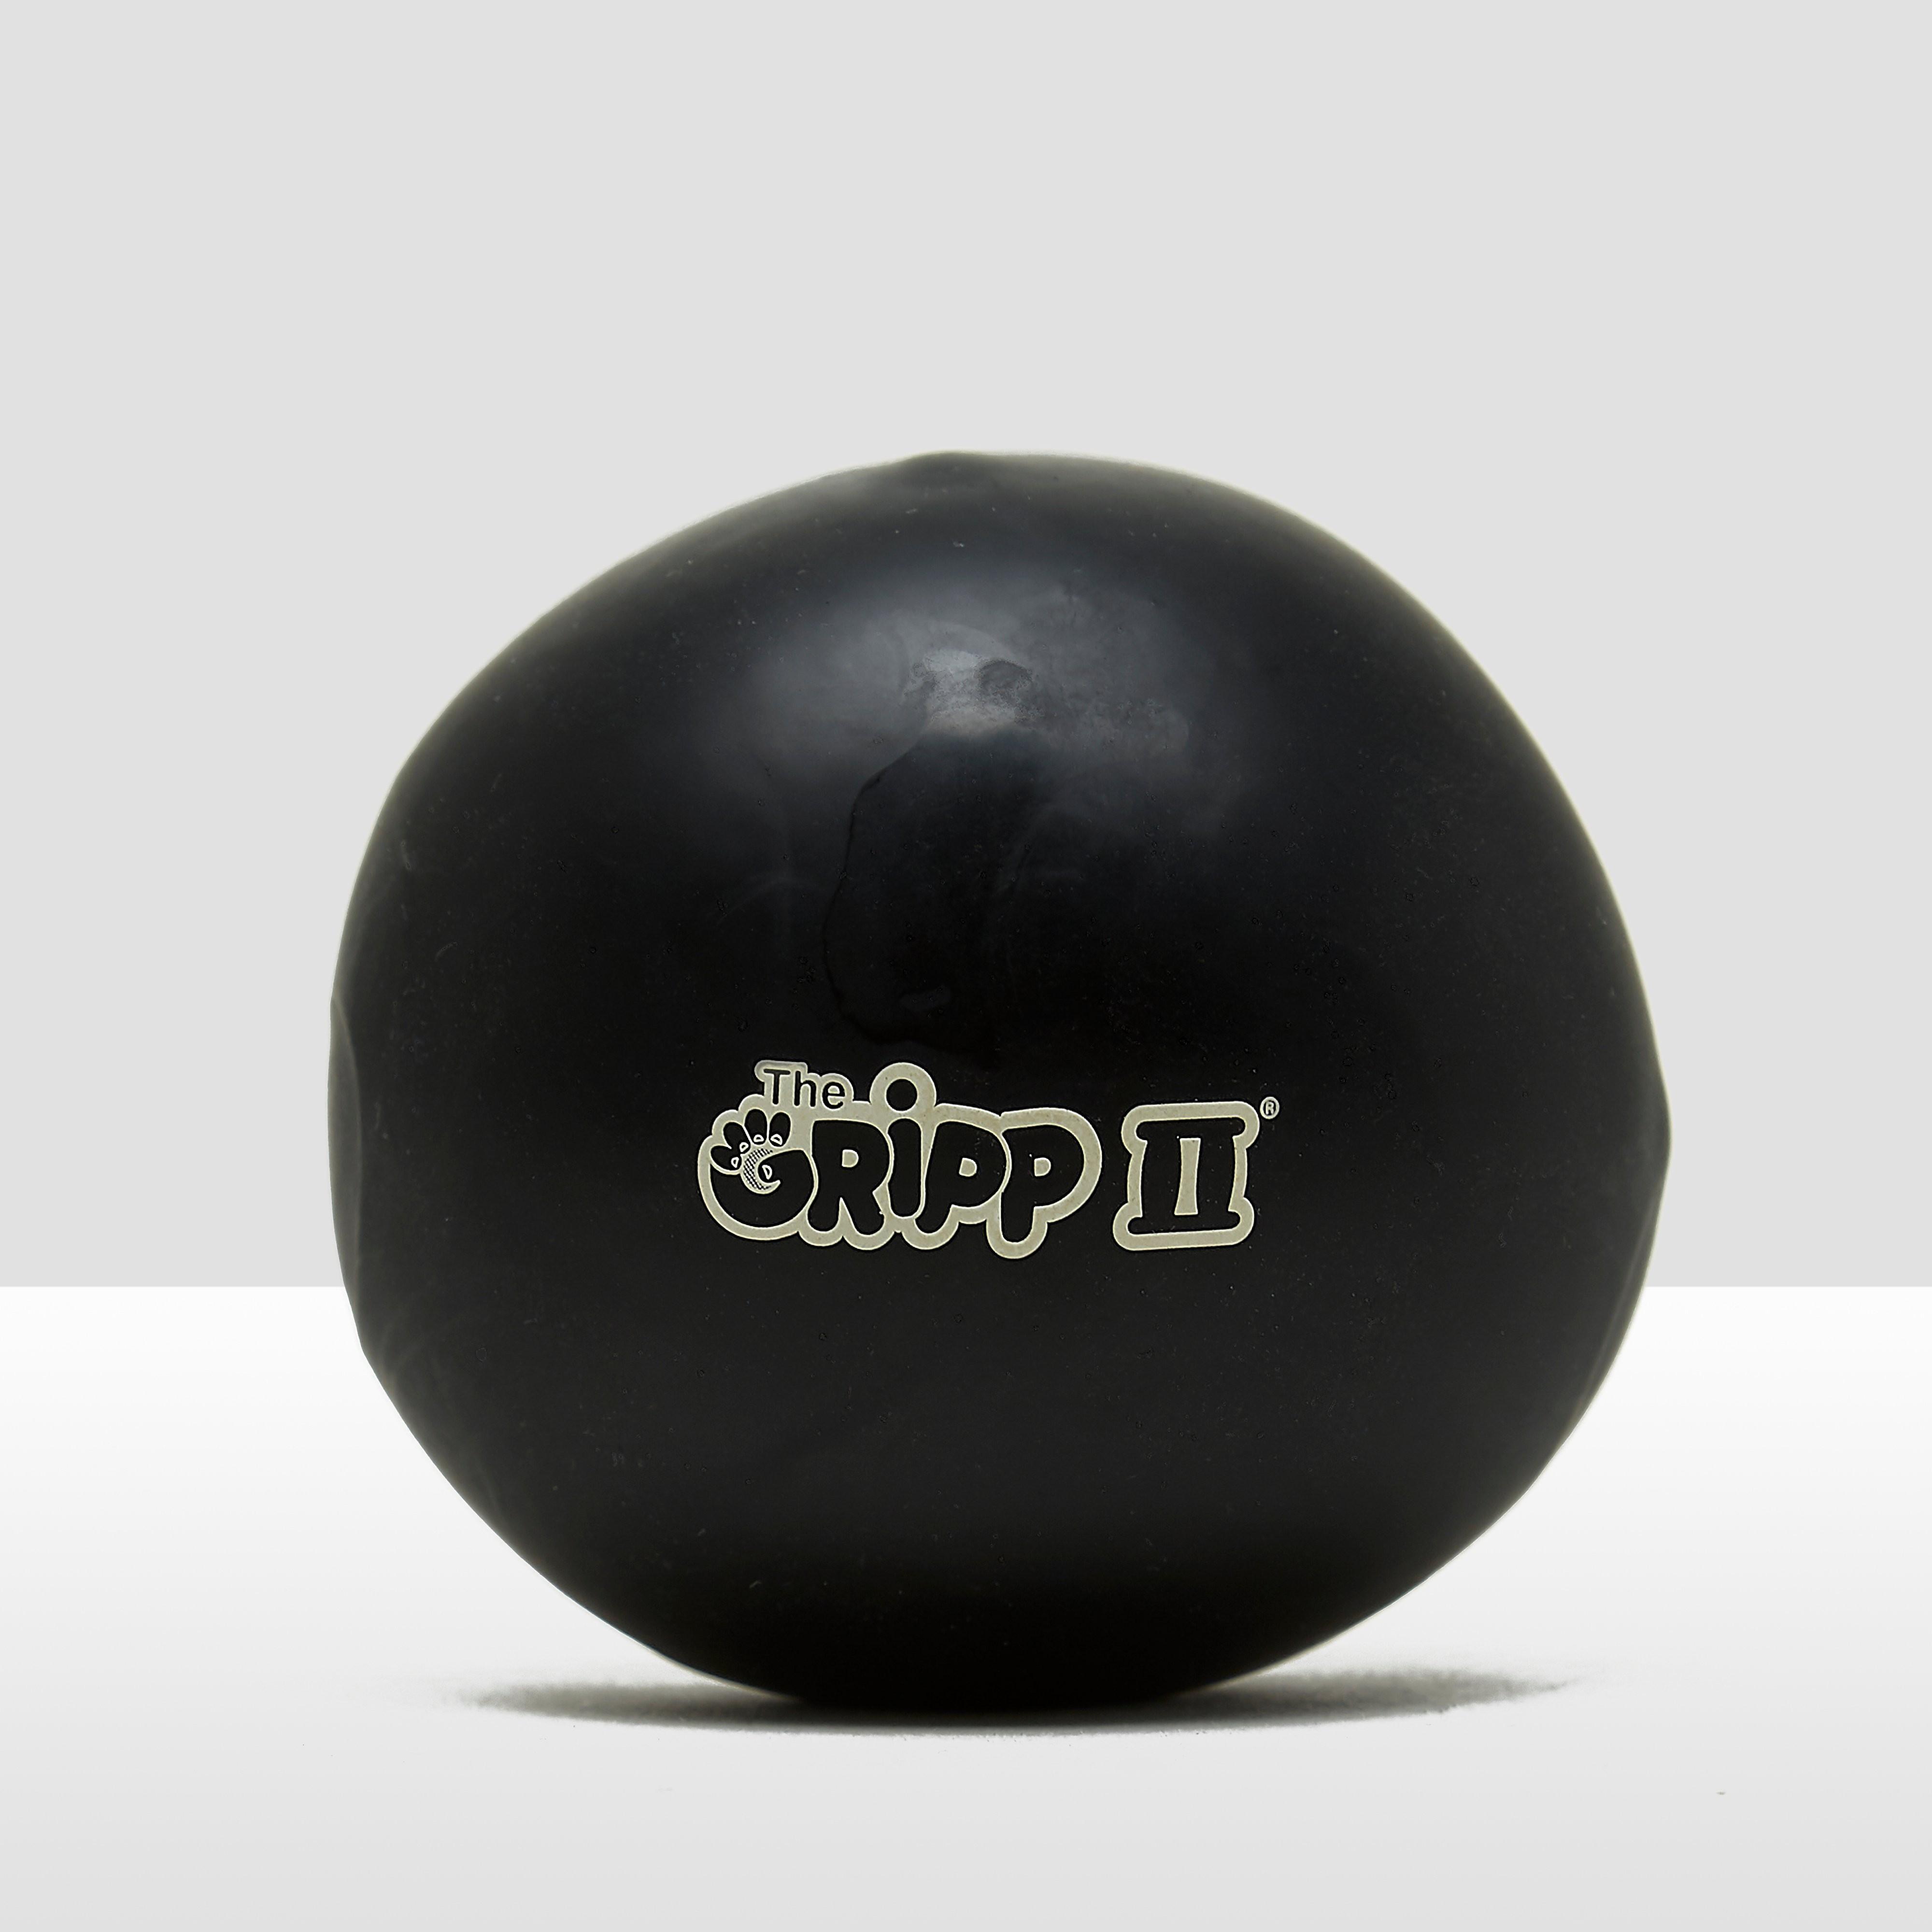 ALLRIGHT GRIP & SQUEEZE BALL